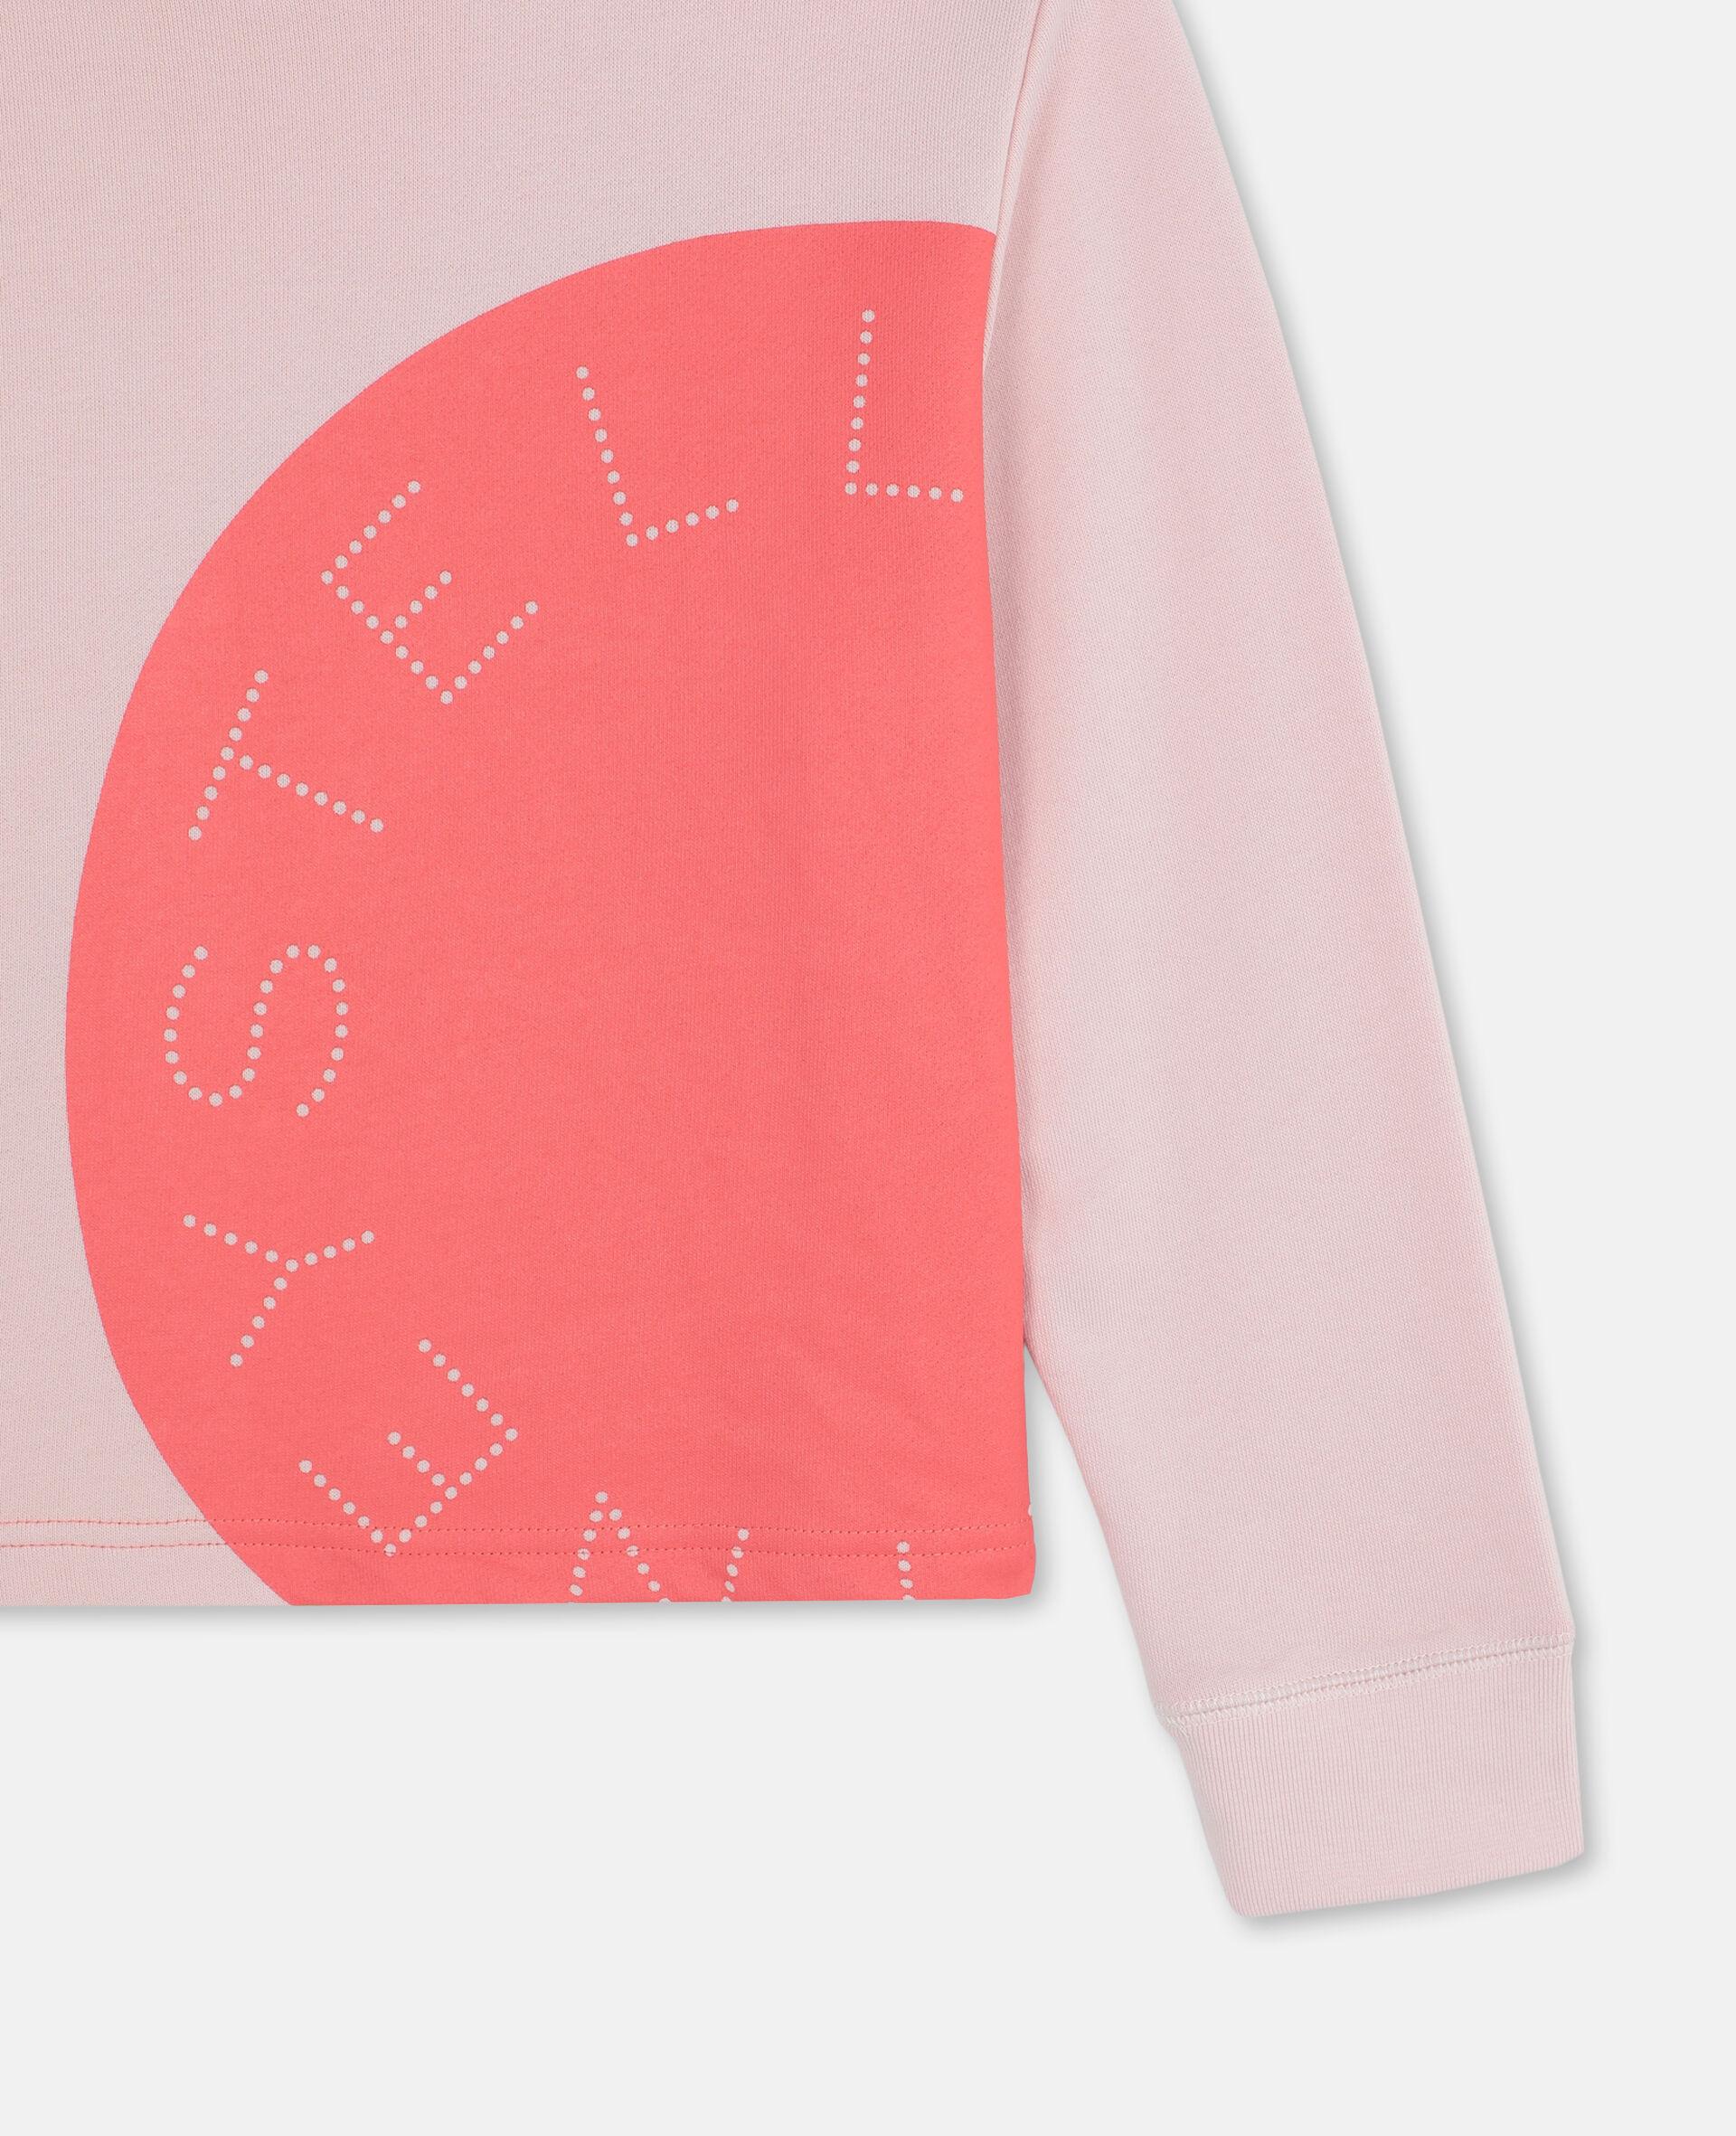 Sportliches Baumwollfleece-Sweatshirt mit Logo-Rose-large image number 1